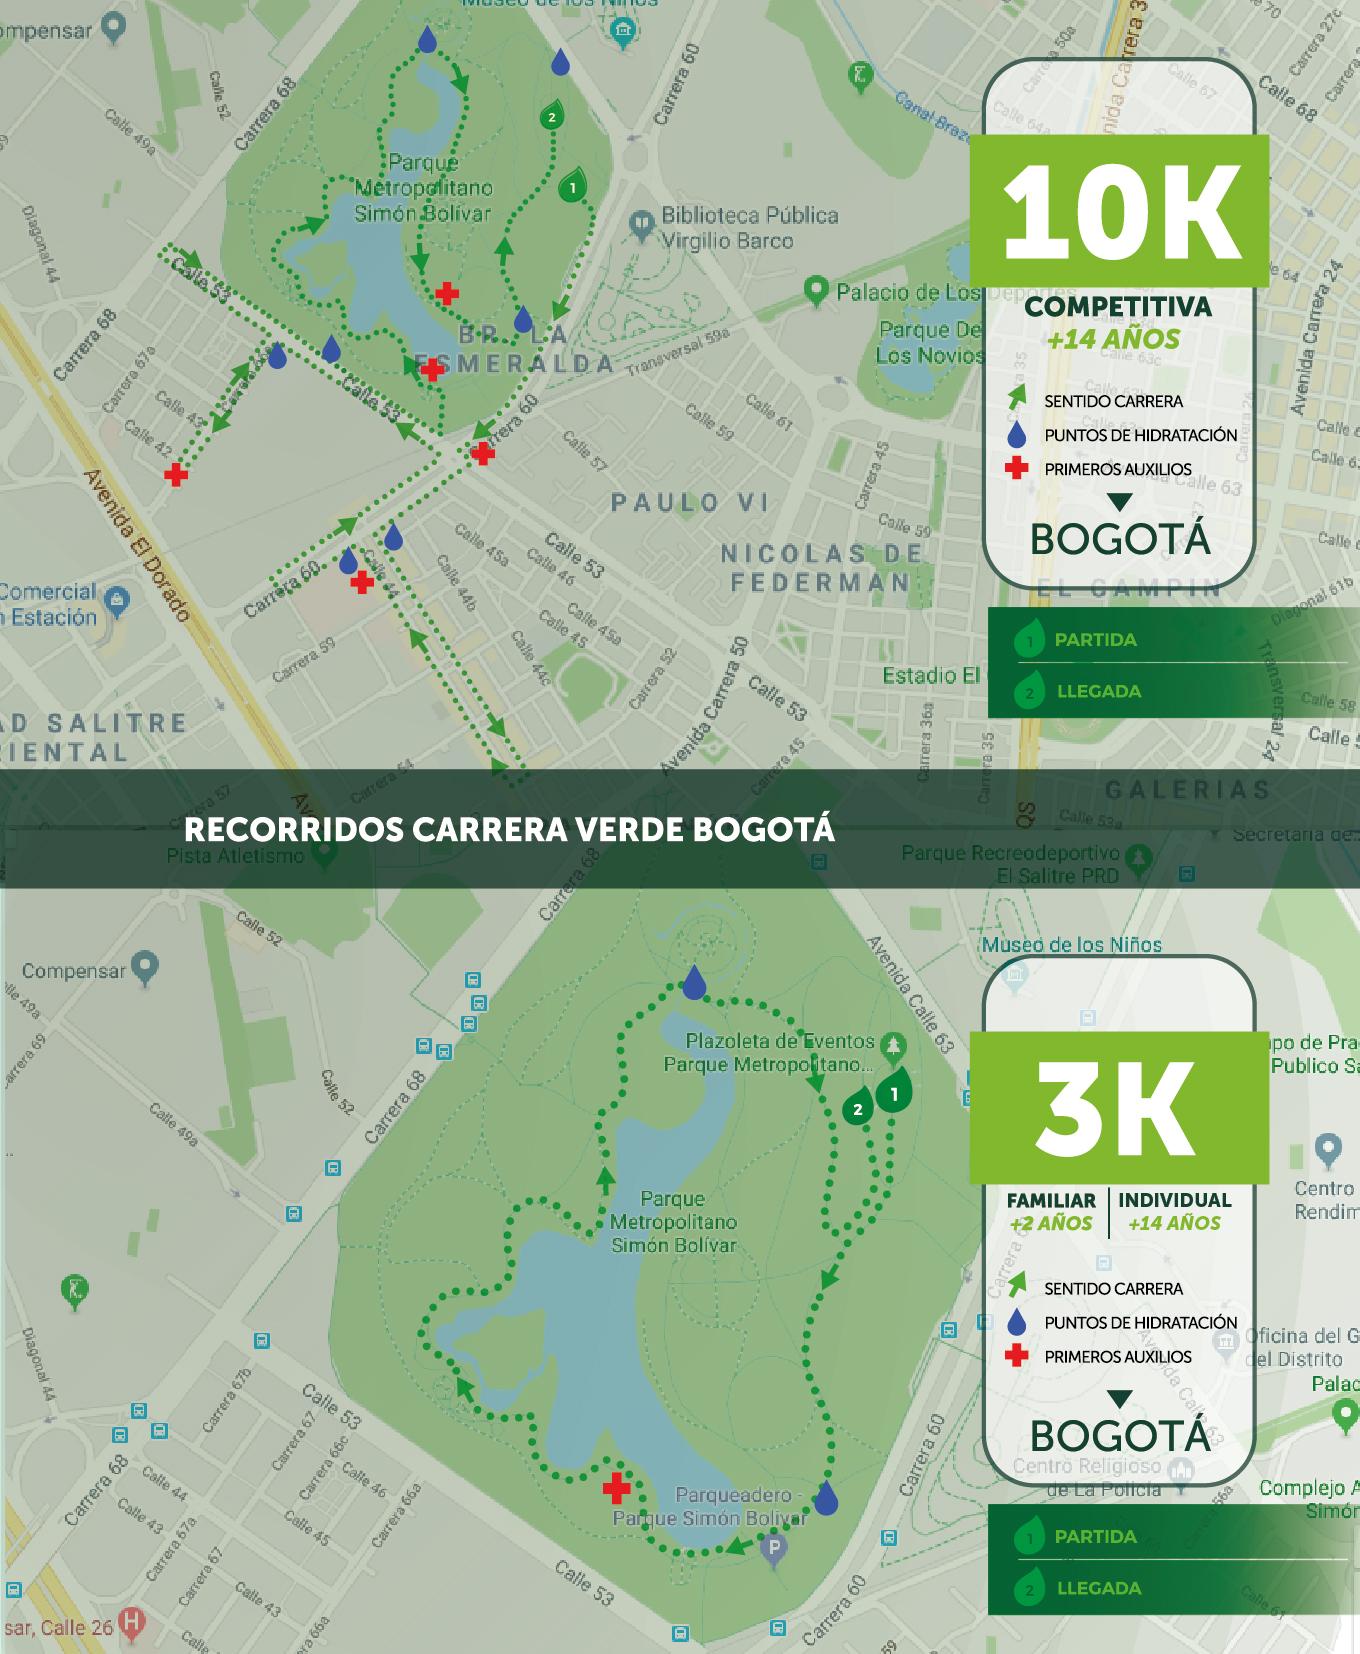 rutas-recorrido-carrera-verde-2019